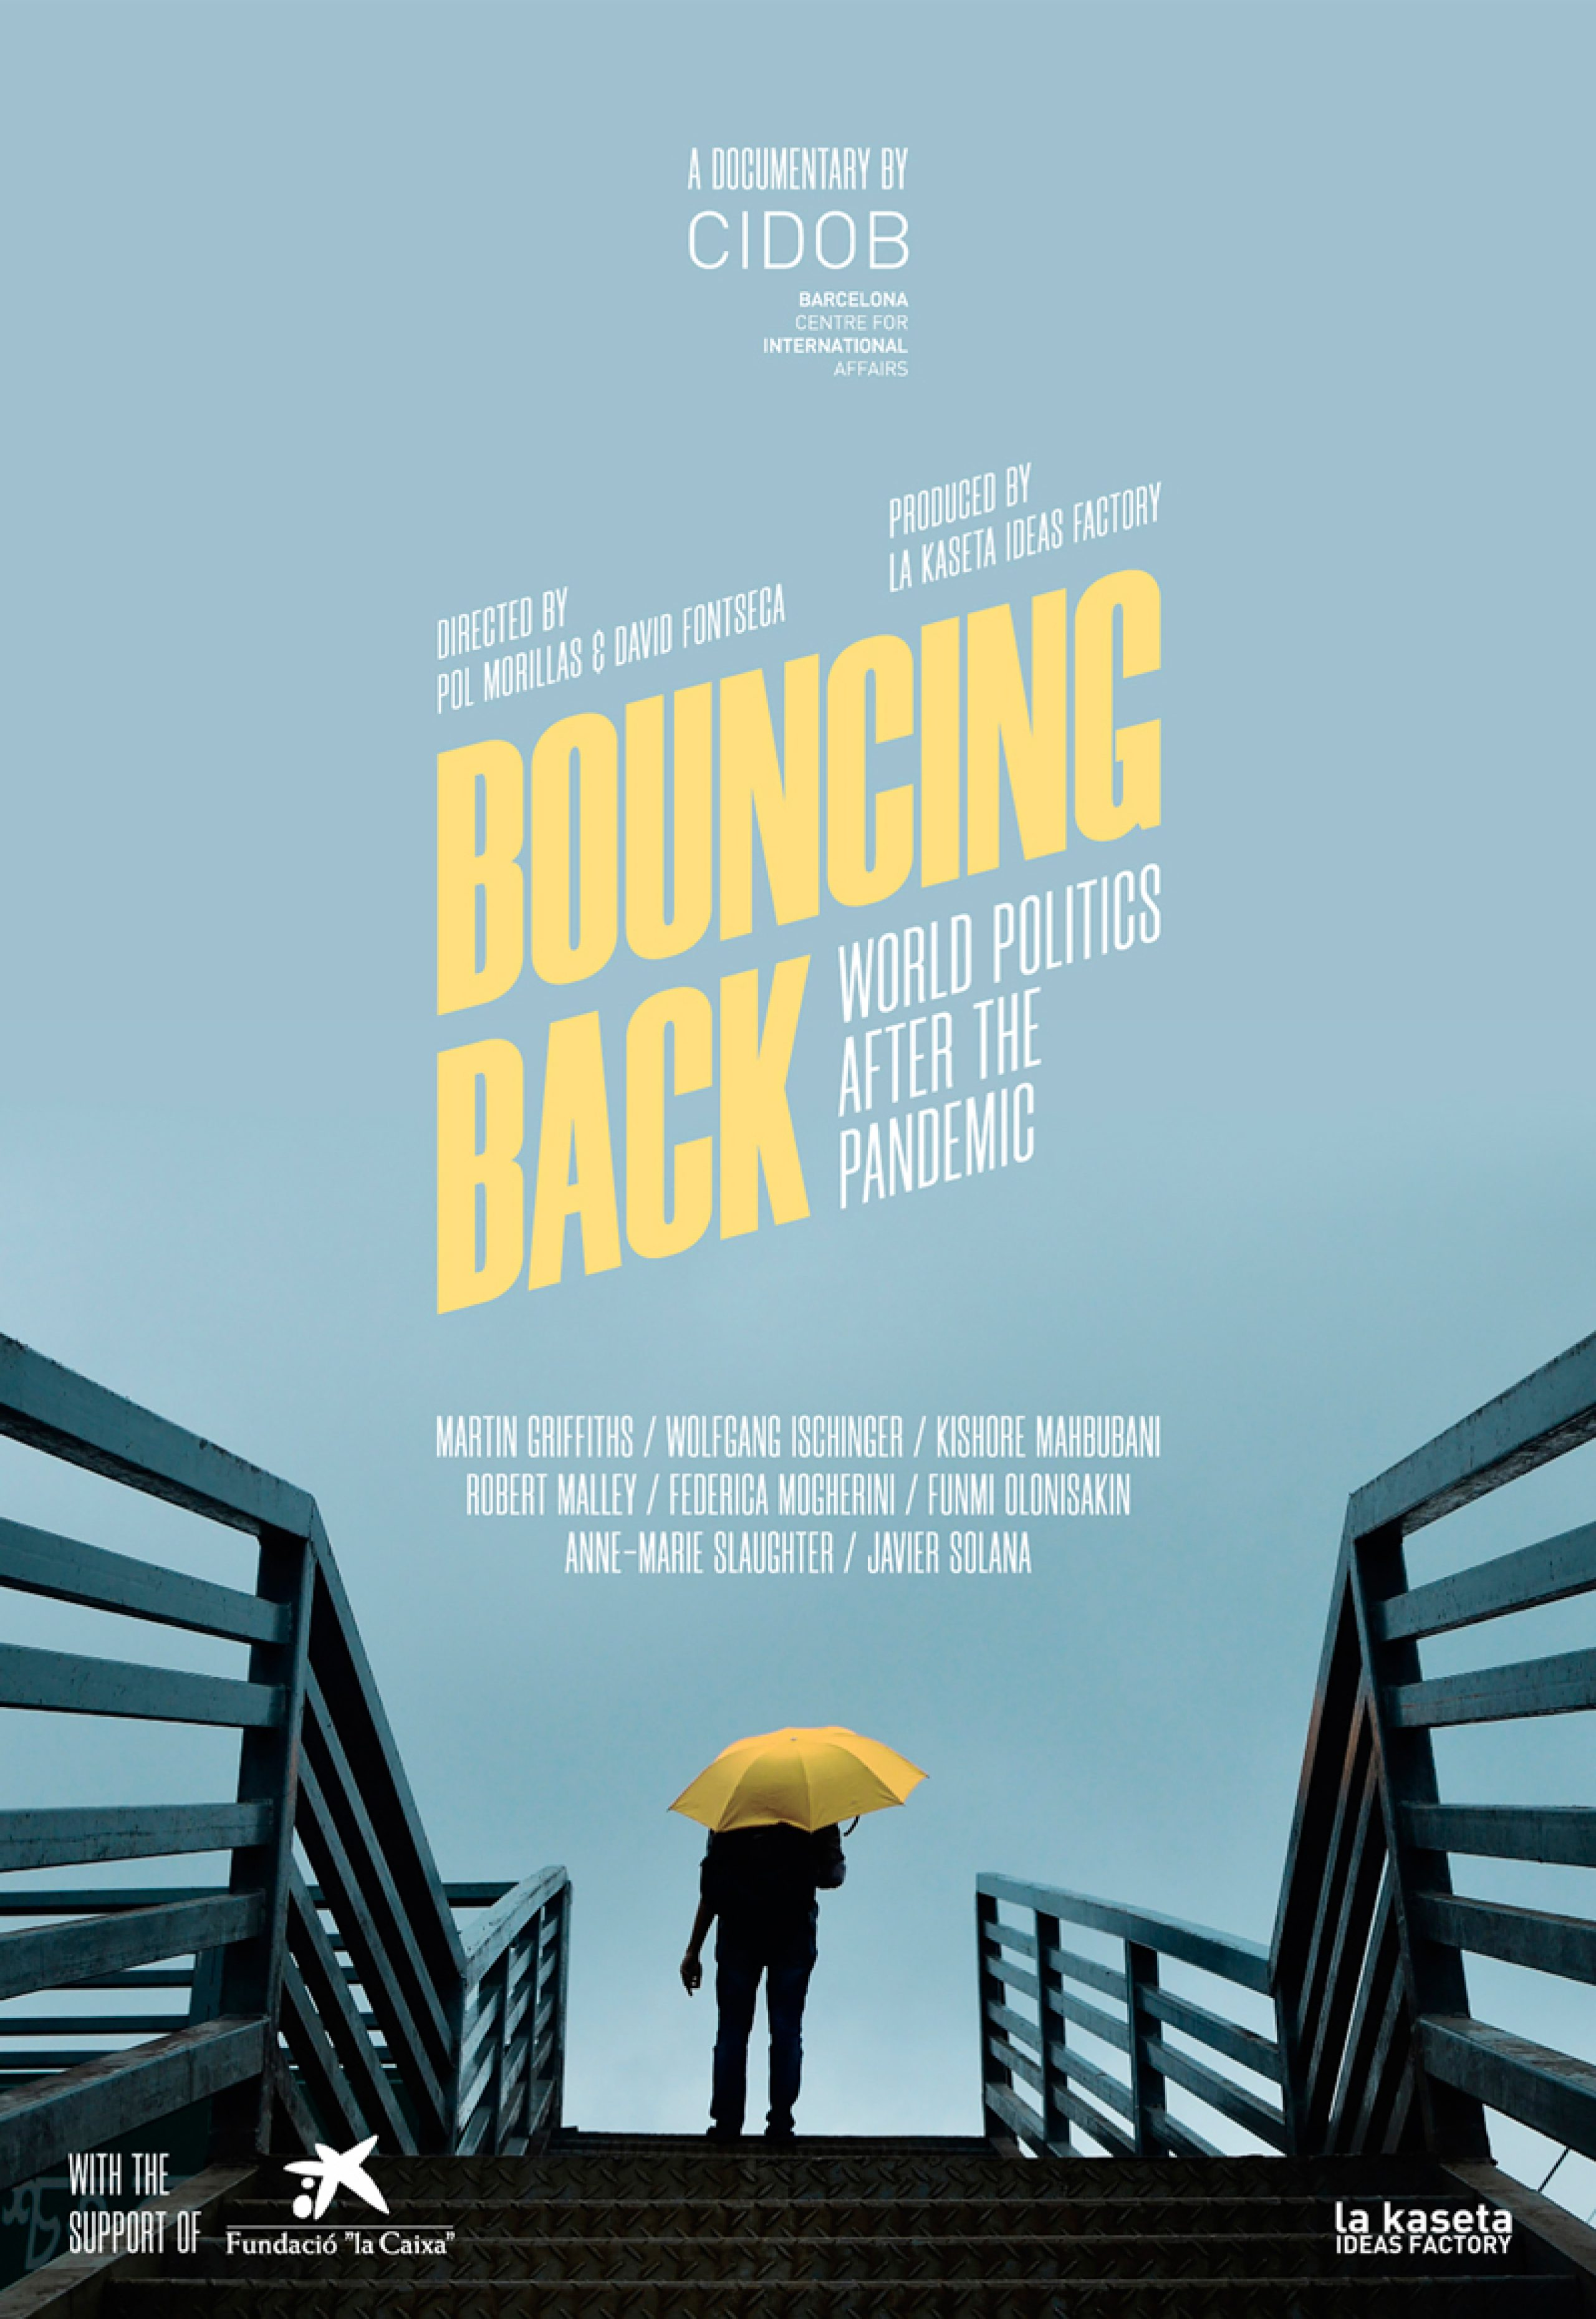 Poster_BOSN_BOUNCING_BACK